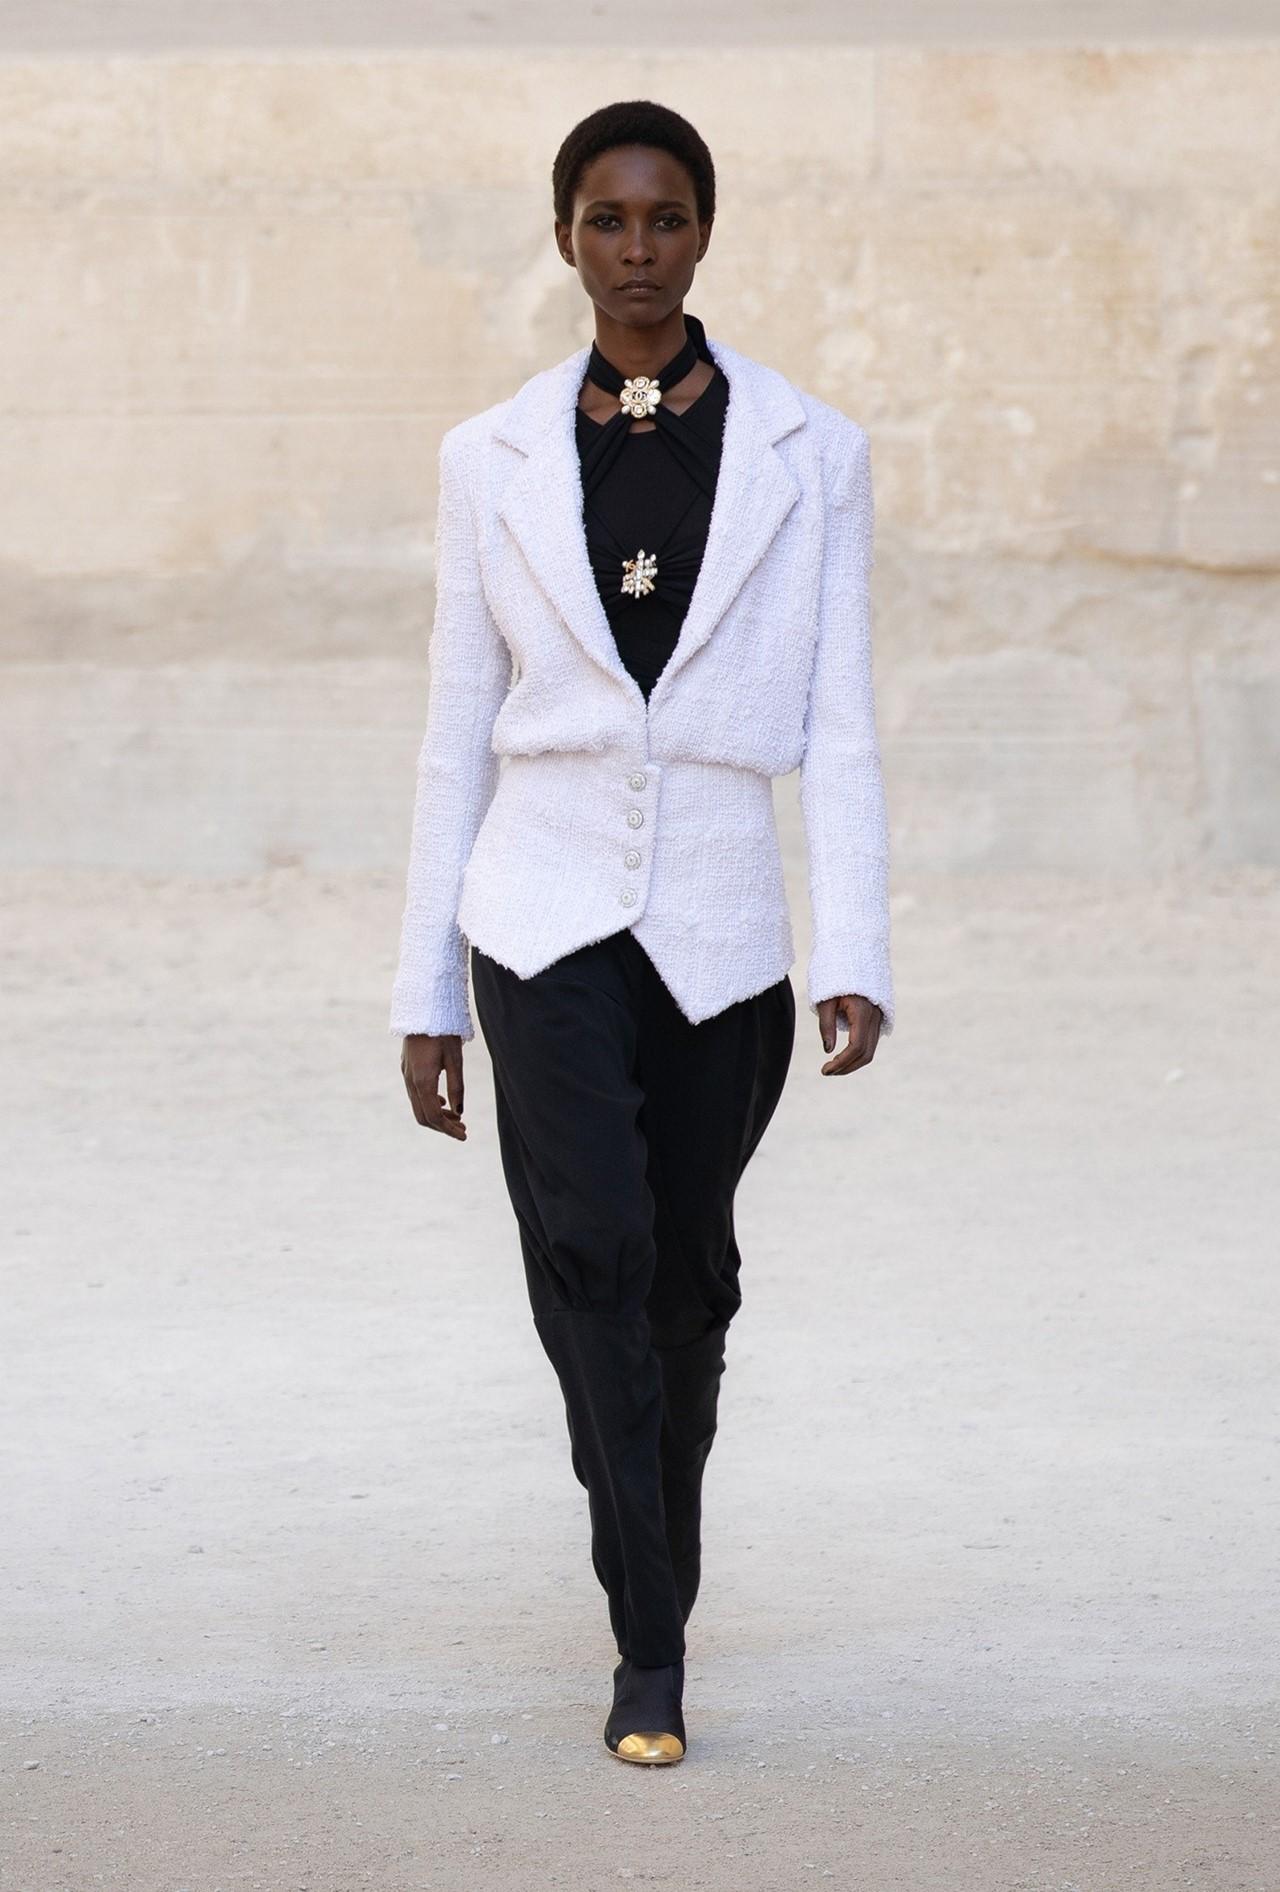 Chanel_Cruise_2022_Fashionela (2)